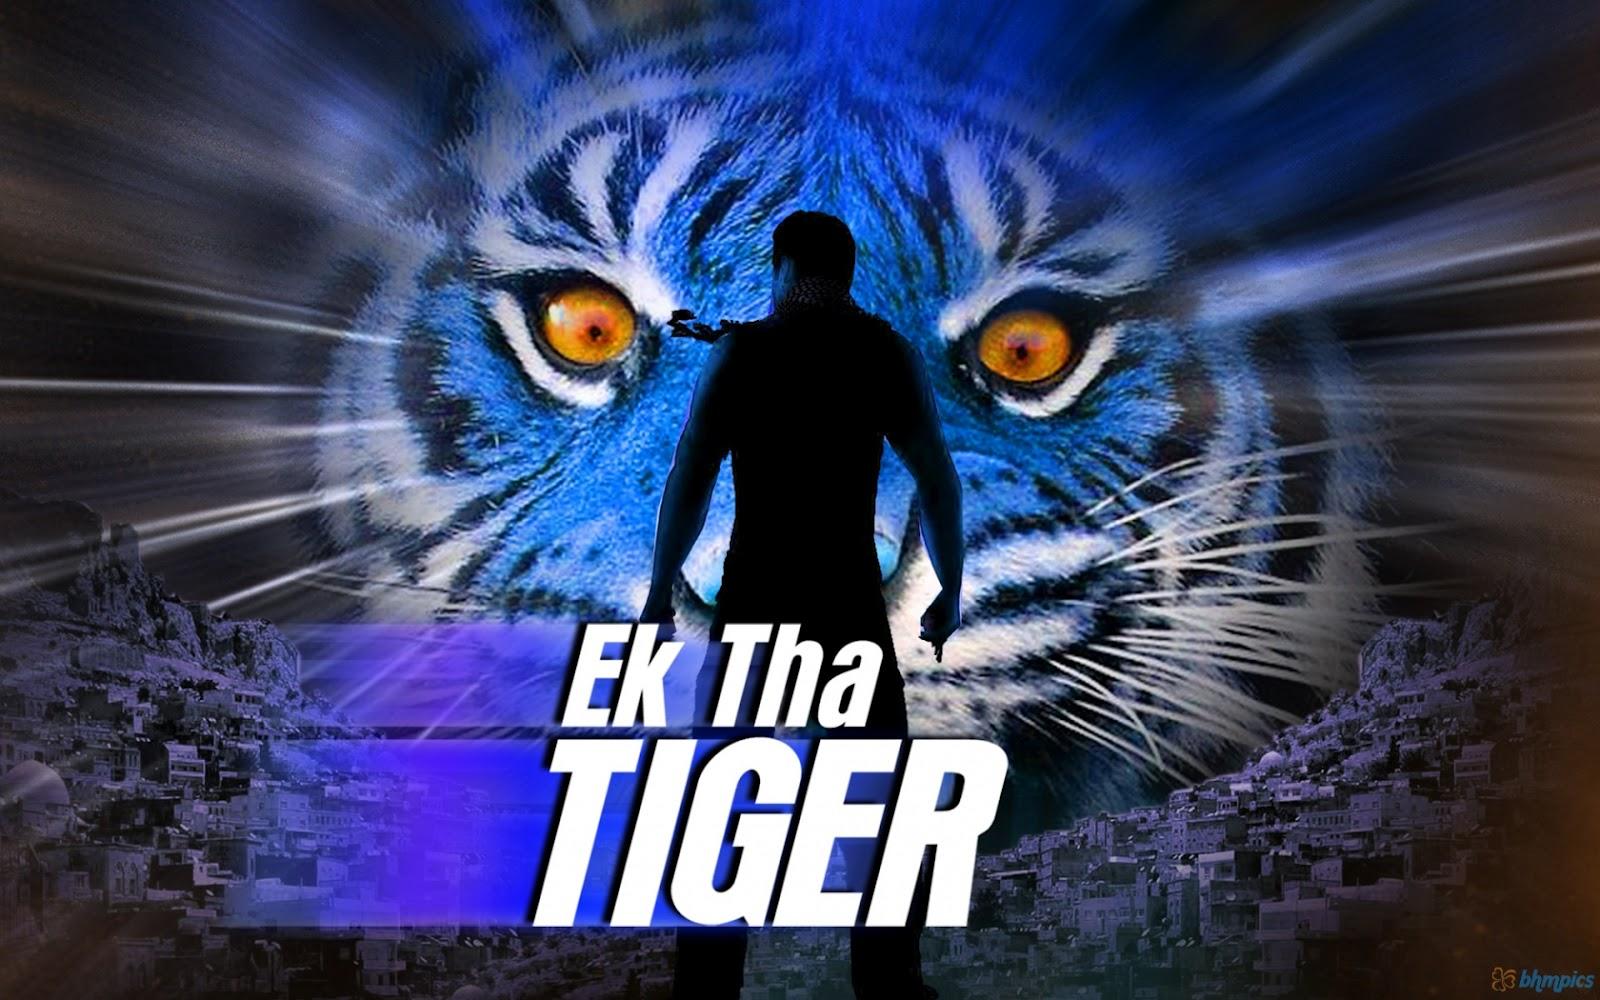 A2z Wallpapers Ek Tha Tiger Movie Wallpapers